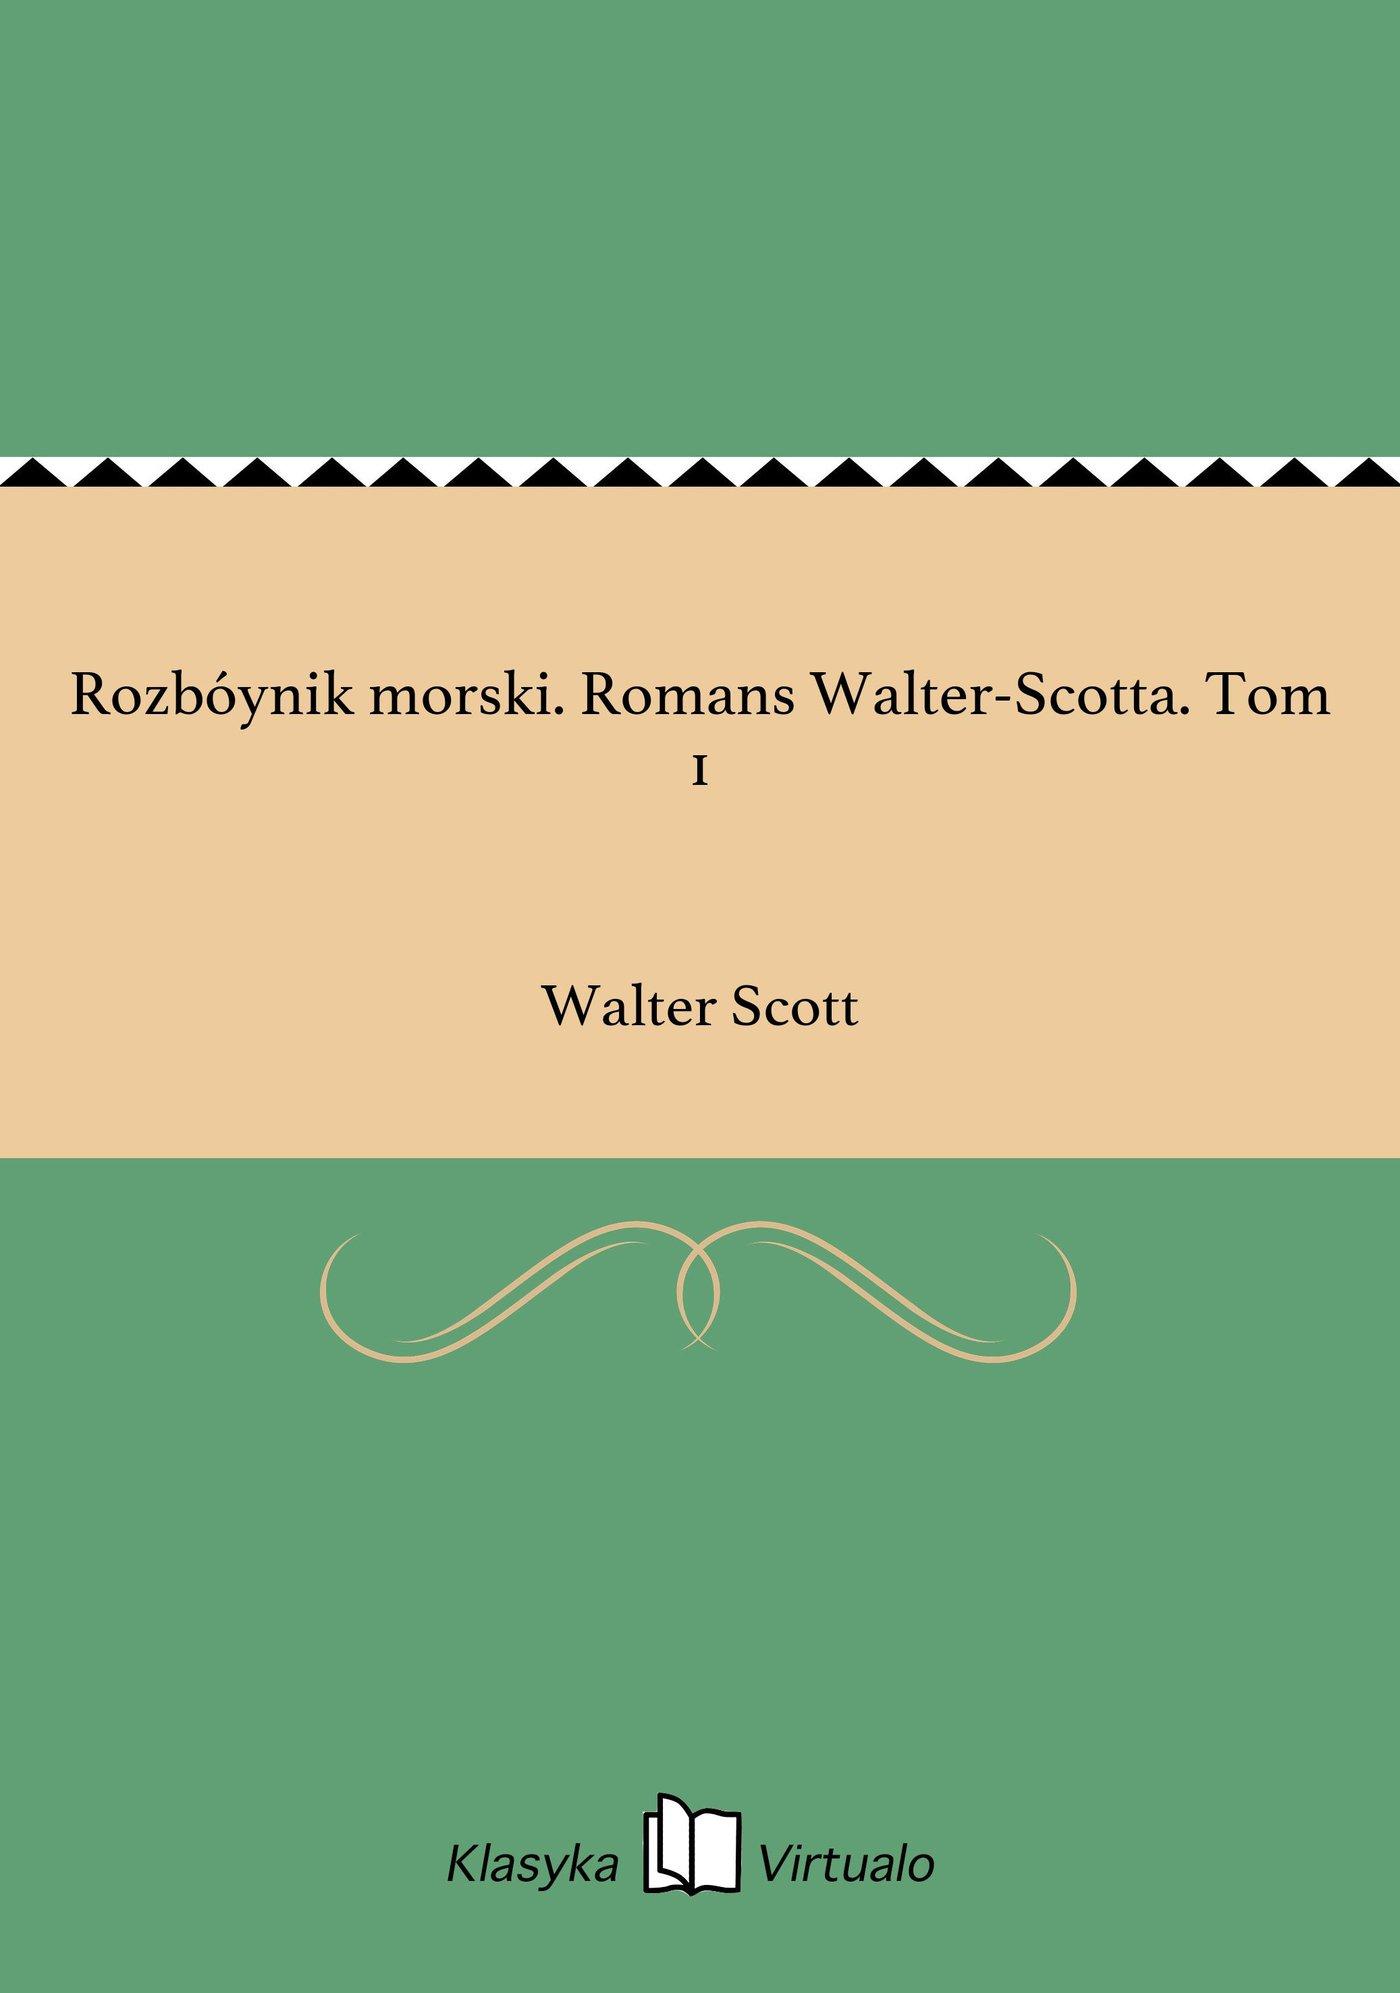 Rozbóynik morski. Romans Walter-Scotta. Tom 1 - Ebook (Książka EPUB) do pobrania w formacie EPUB